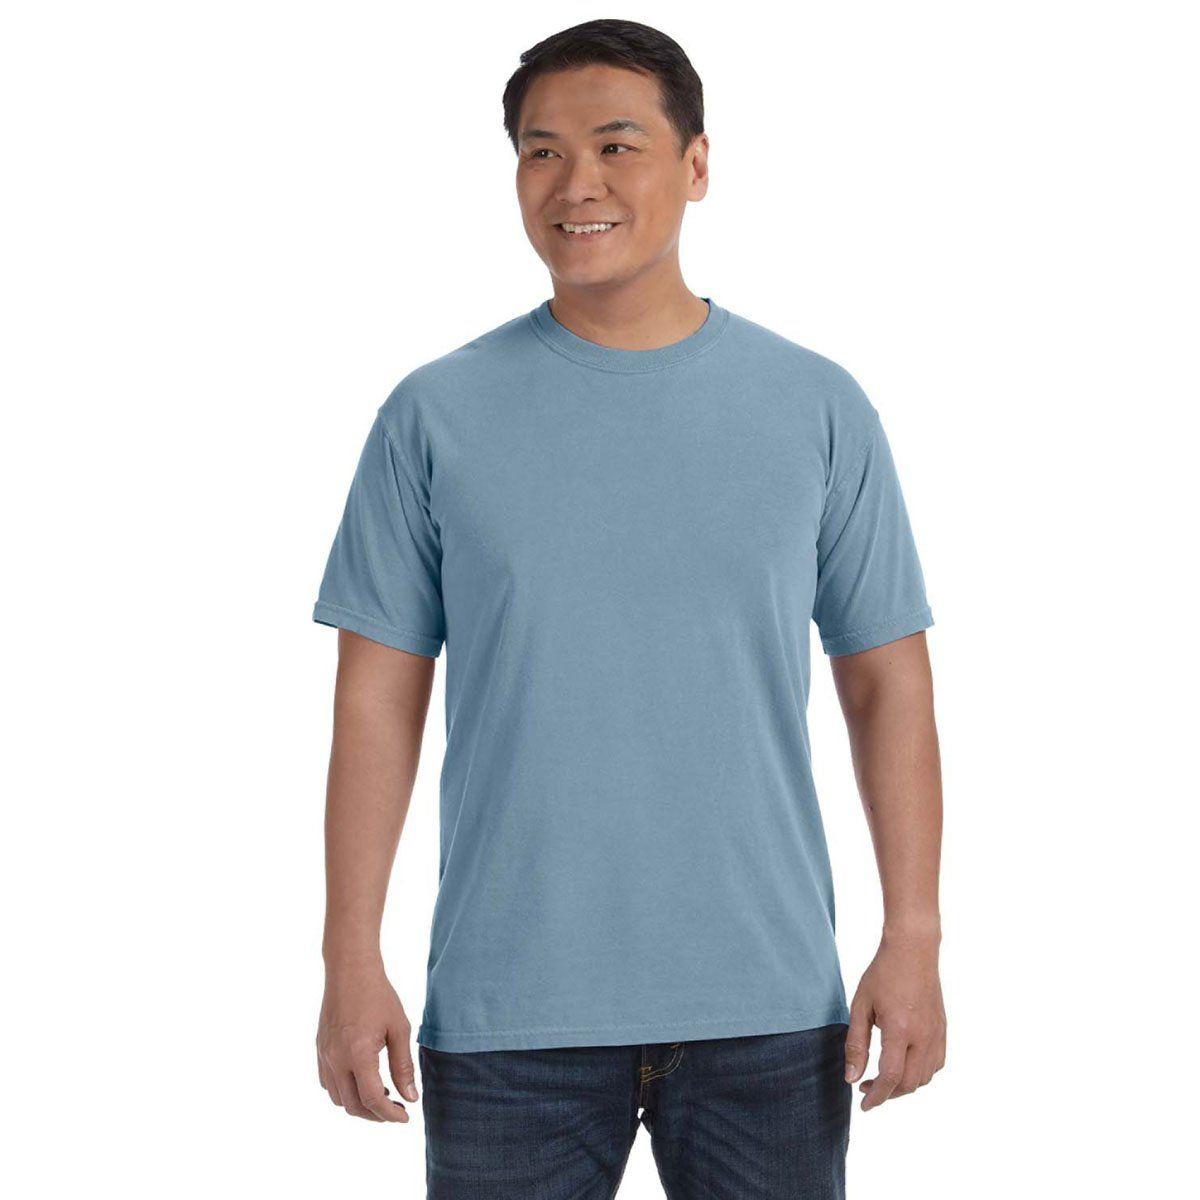 Comfort Colors Men S Bay 6 1 Oz T Shirt Dye T Shirt T Shirt